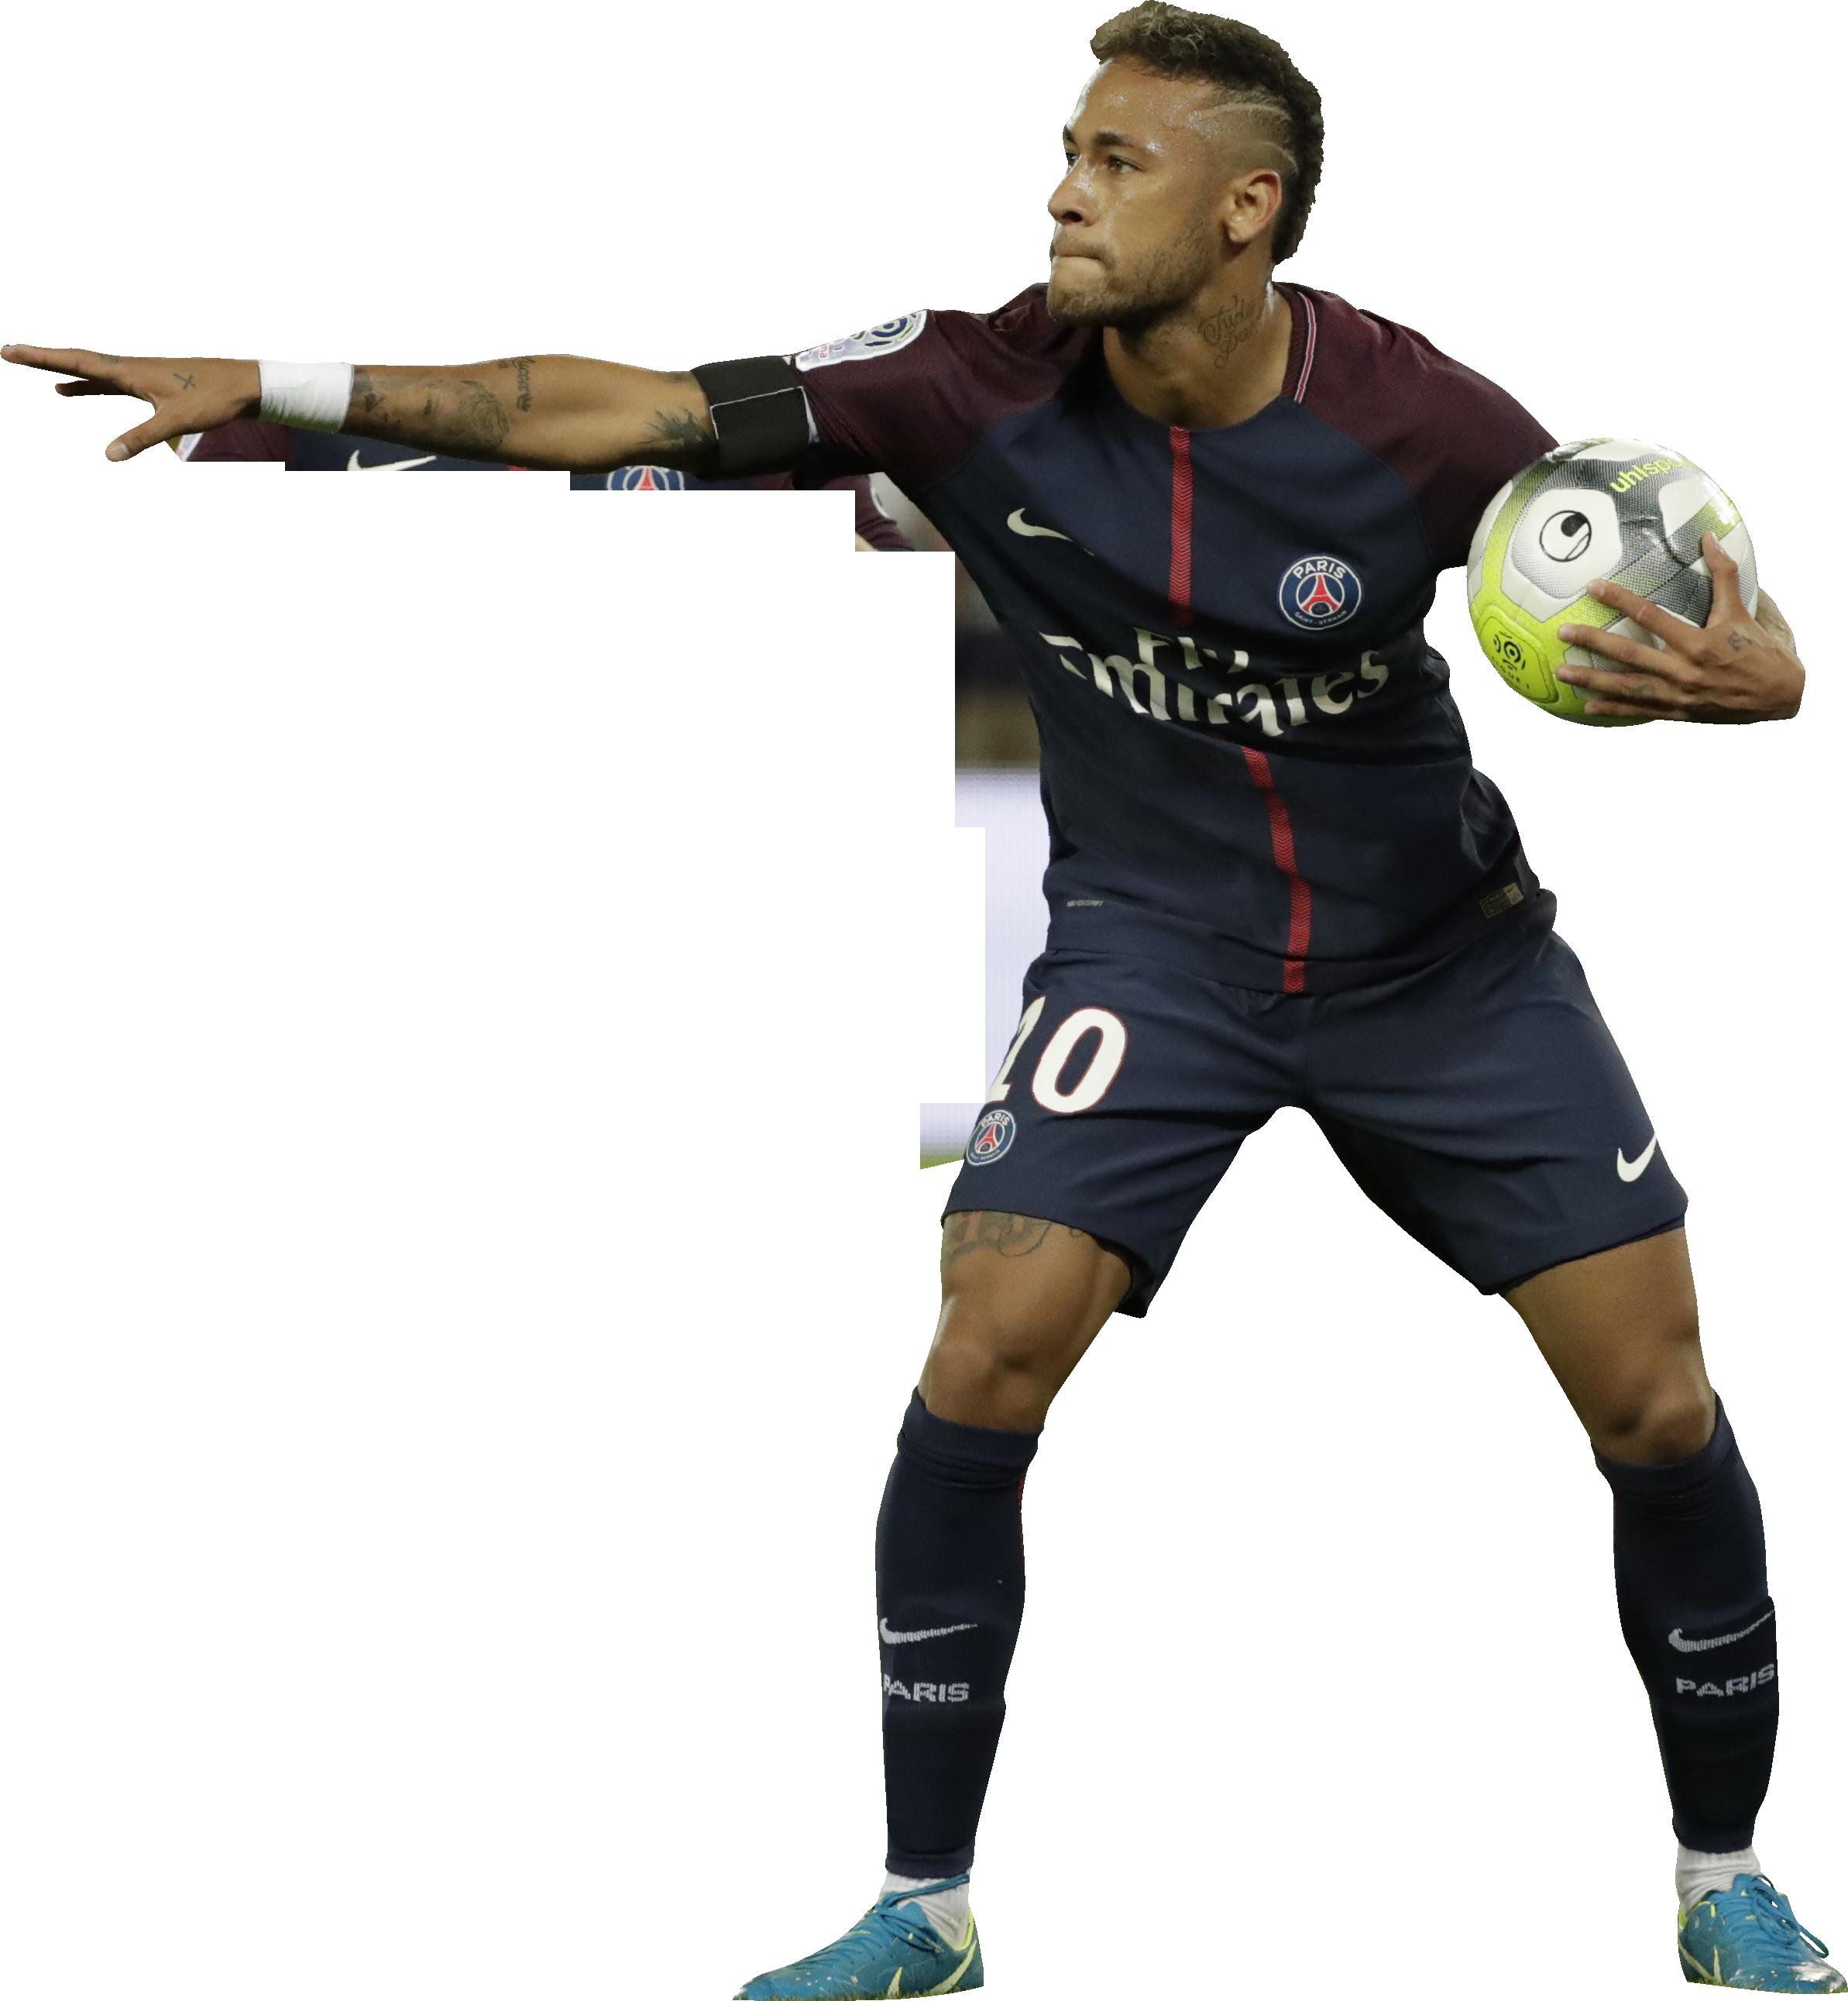 HD Neymar Jr Psg Png Transparent PNG Image Download.